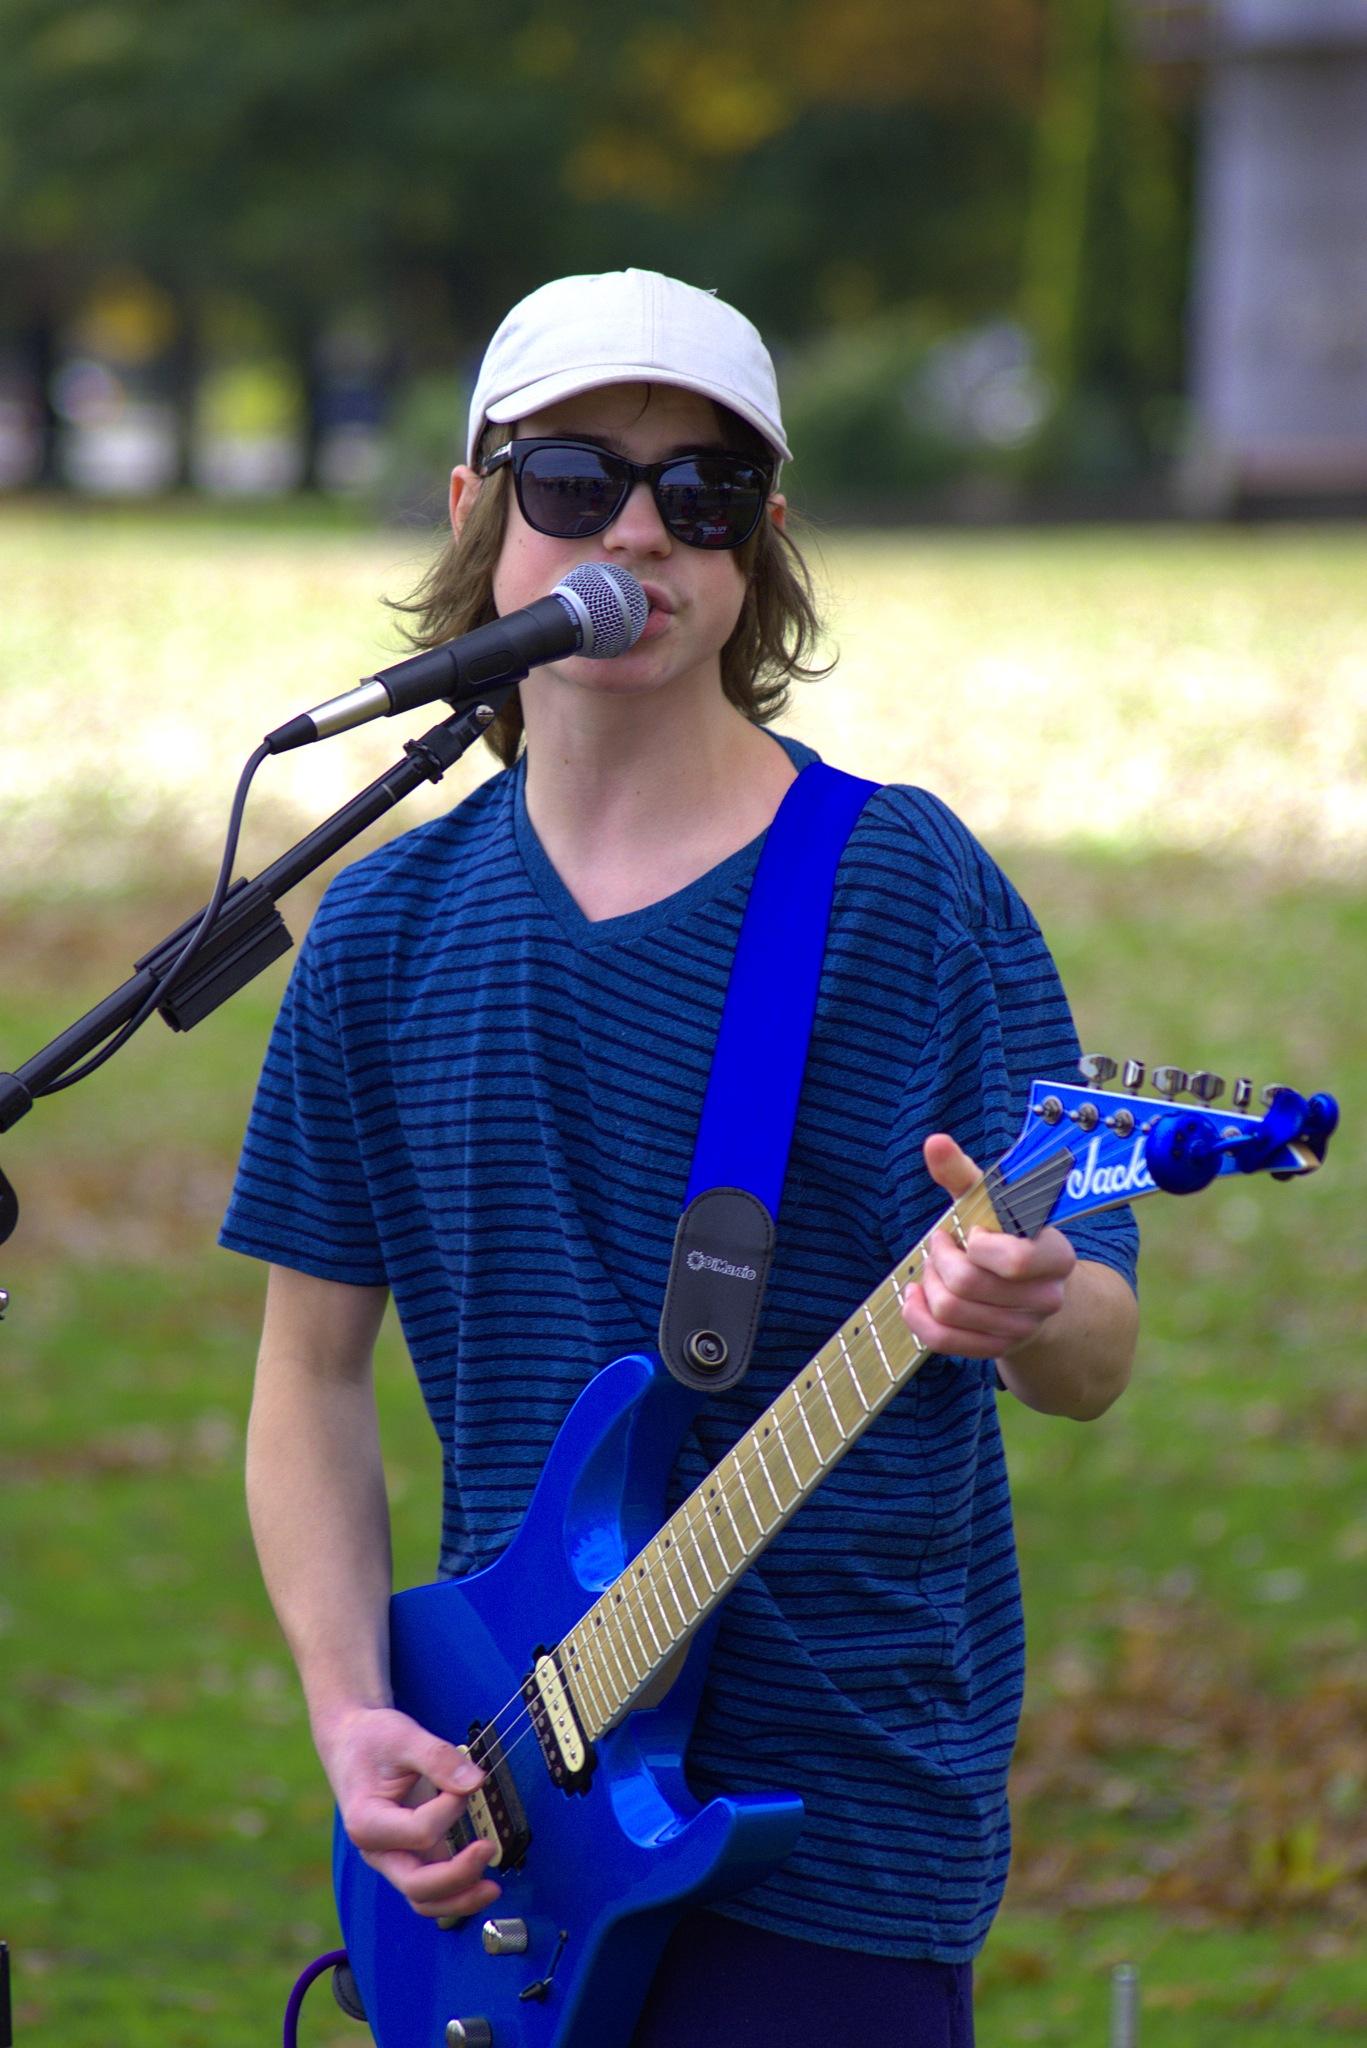 Talented Teen Rocker by pscottwong